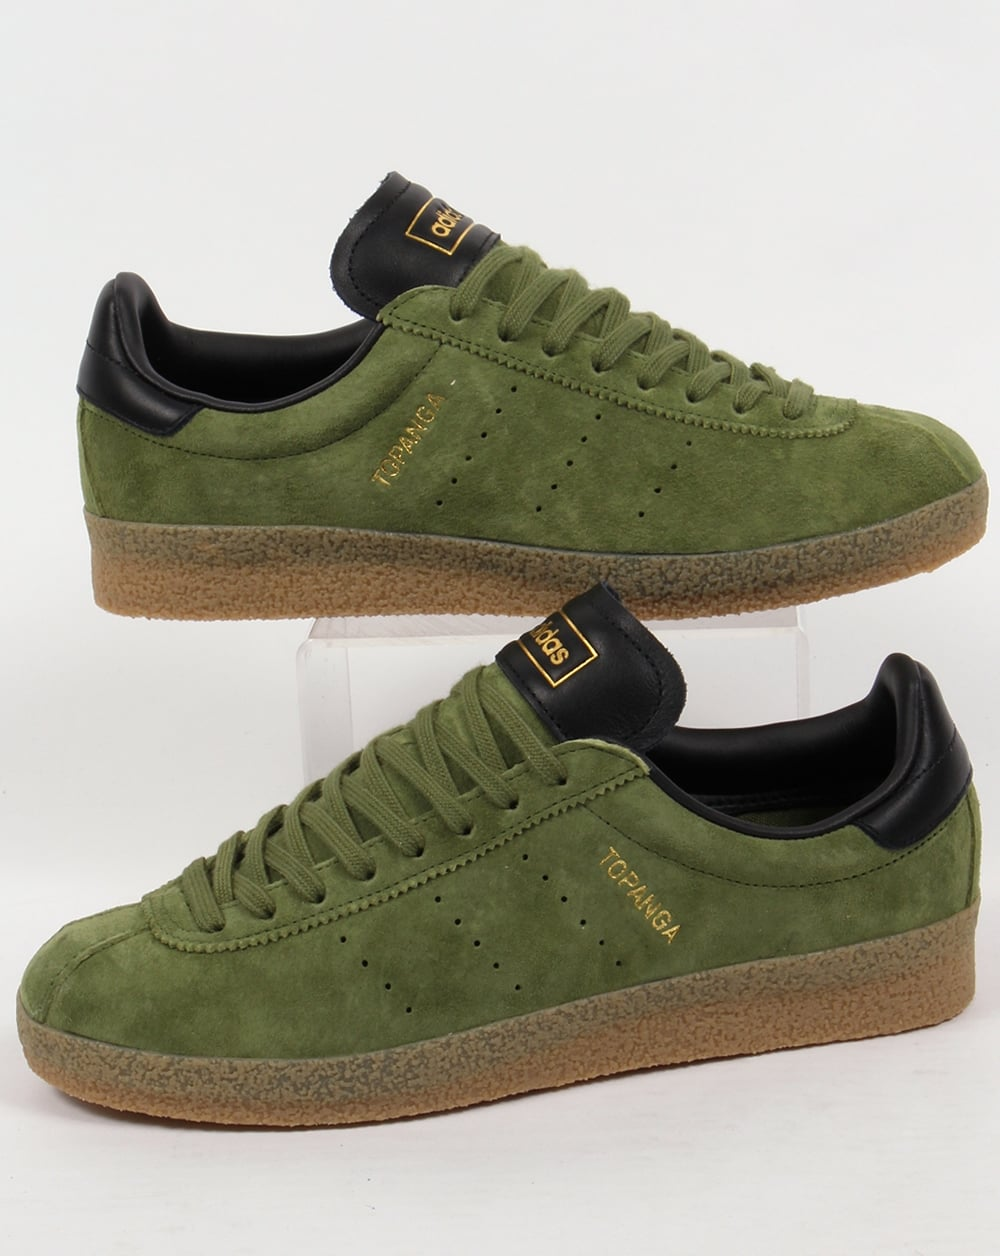 Adidas Topanga Clean Craft Green Gum His trainers